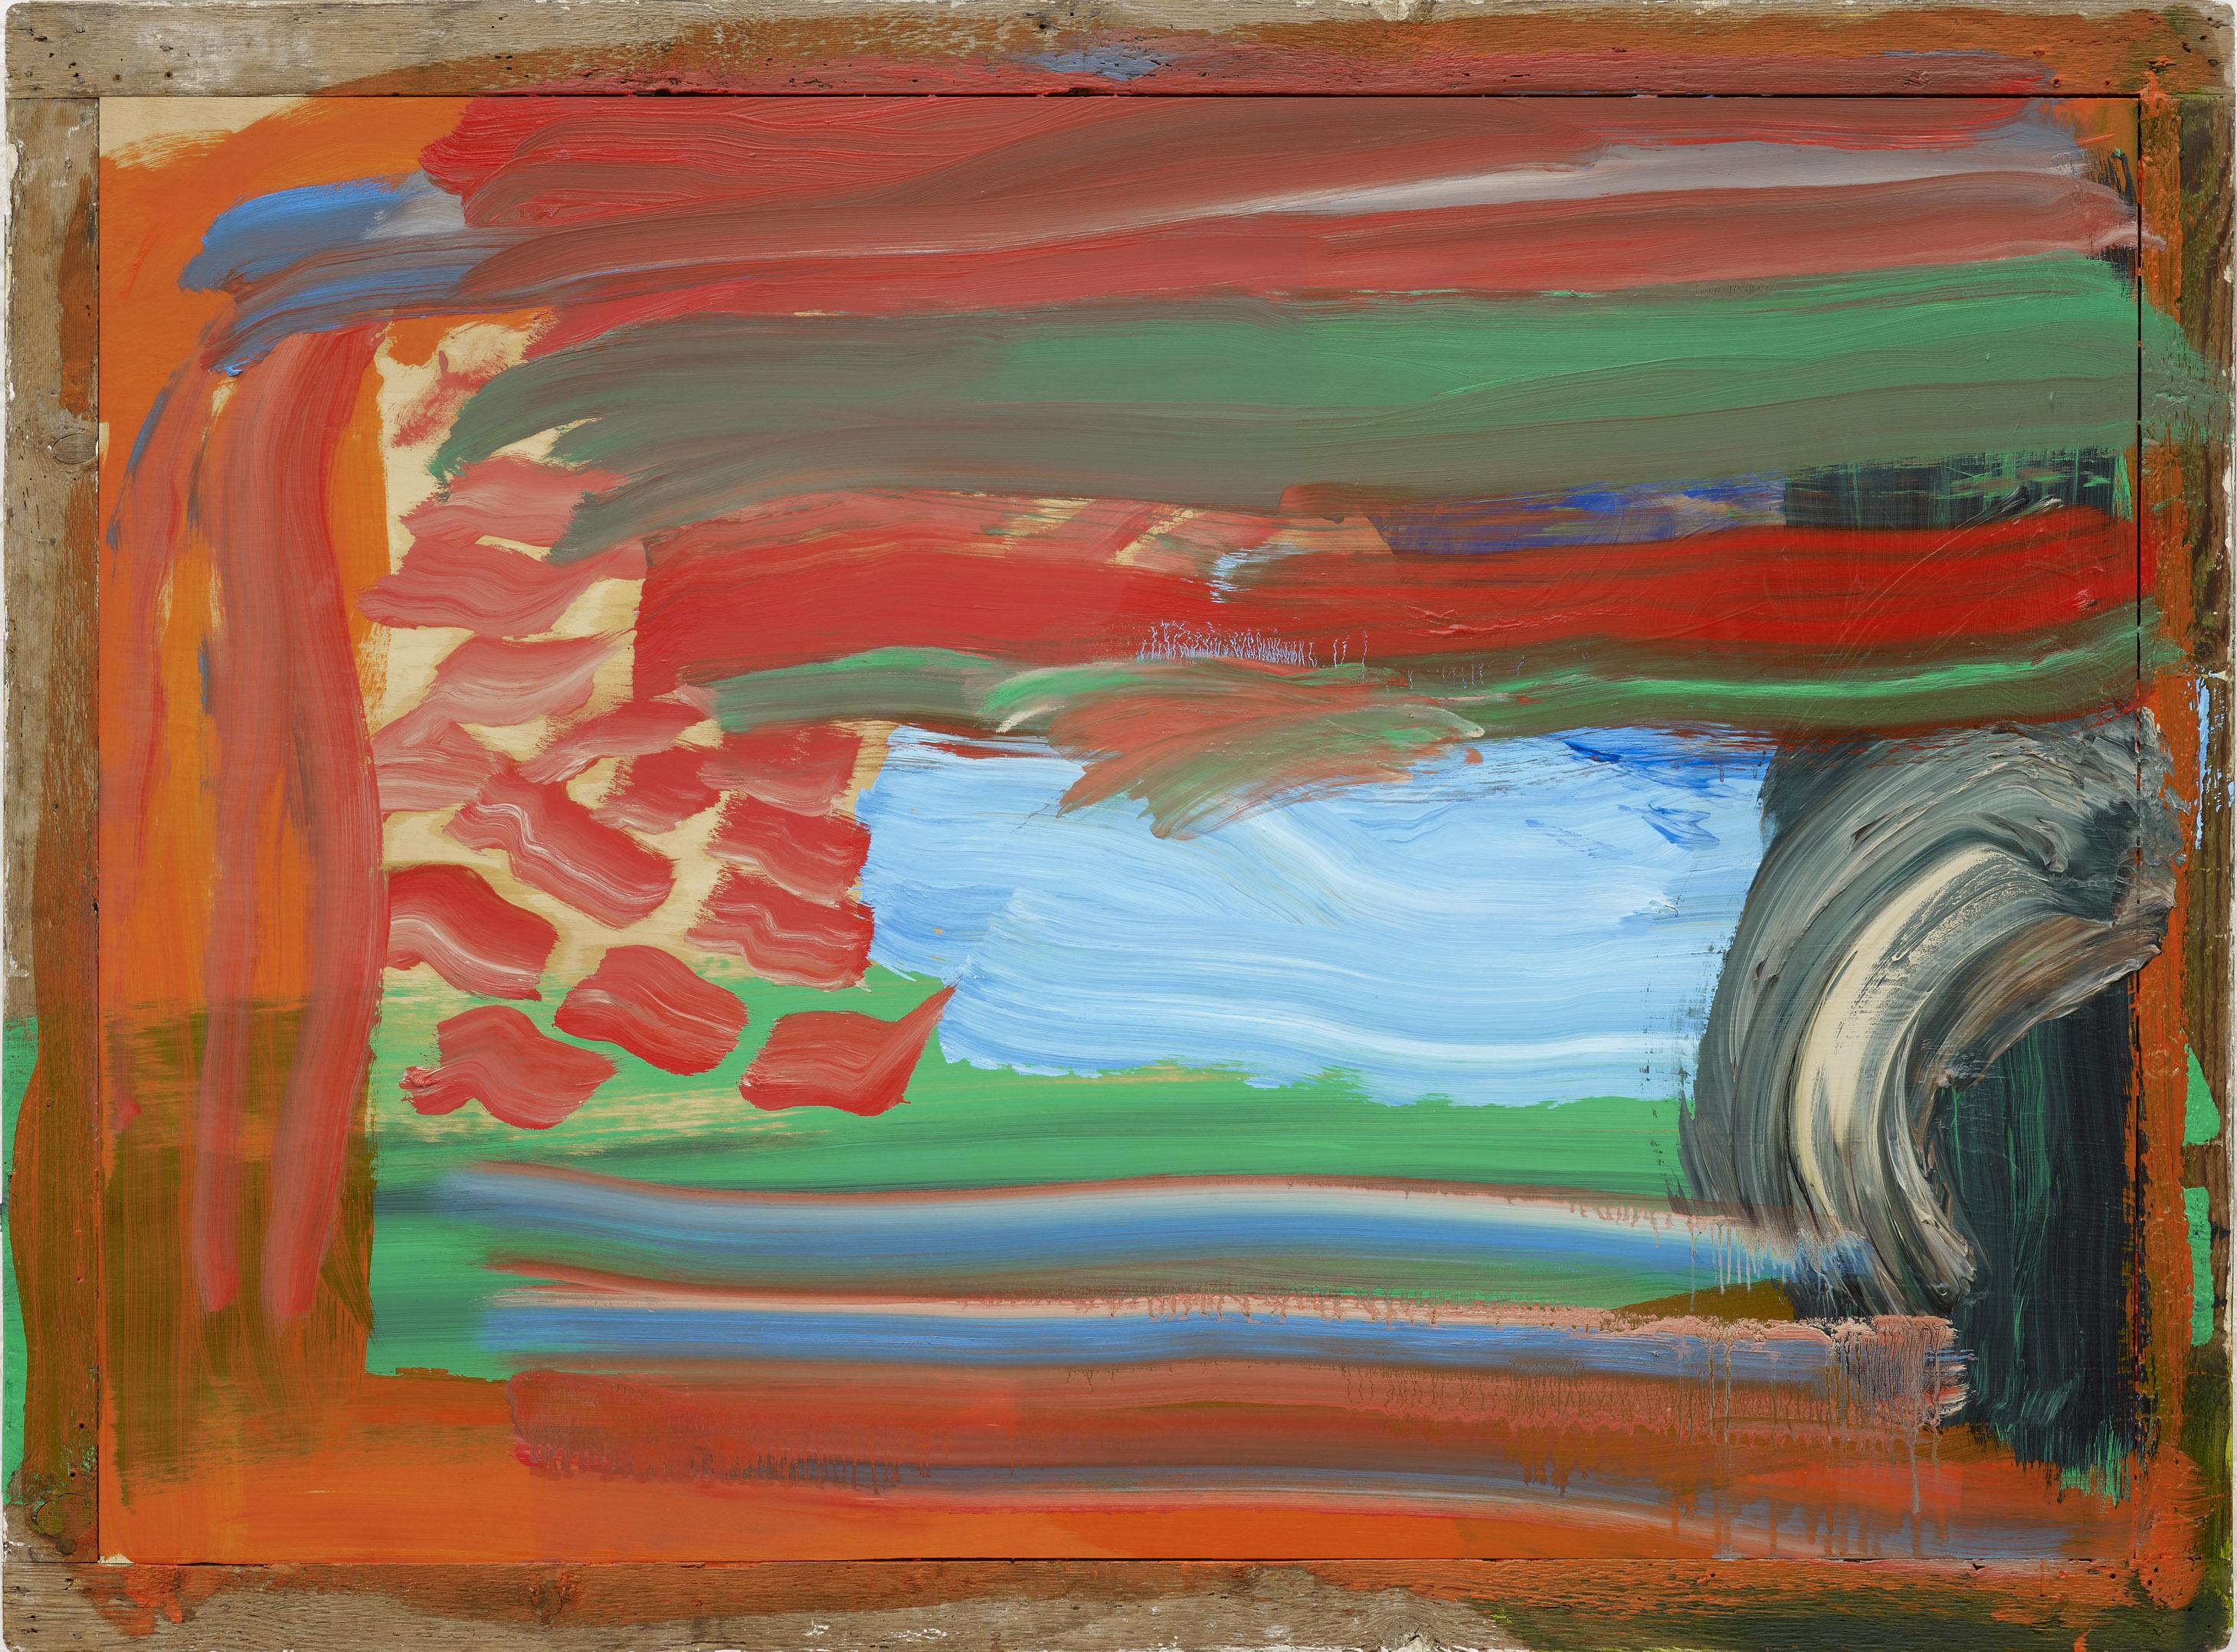 Arriva Howard Hodgkin alla Gagosian Gallery di Roma